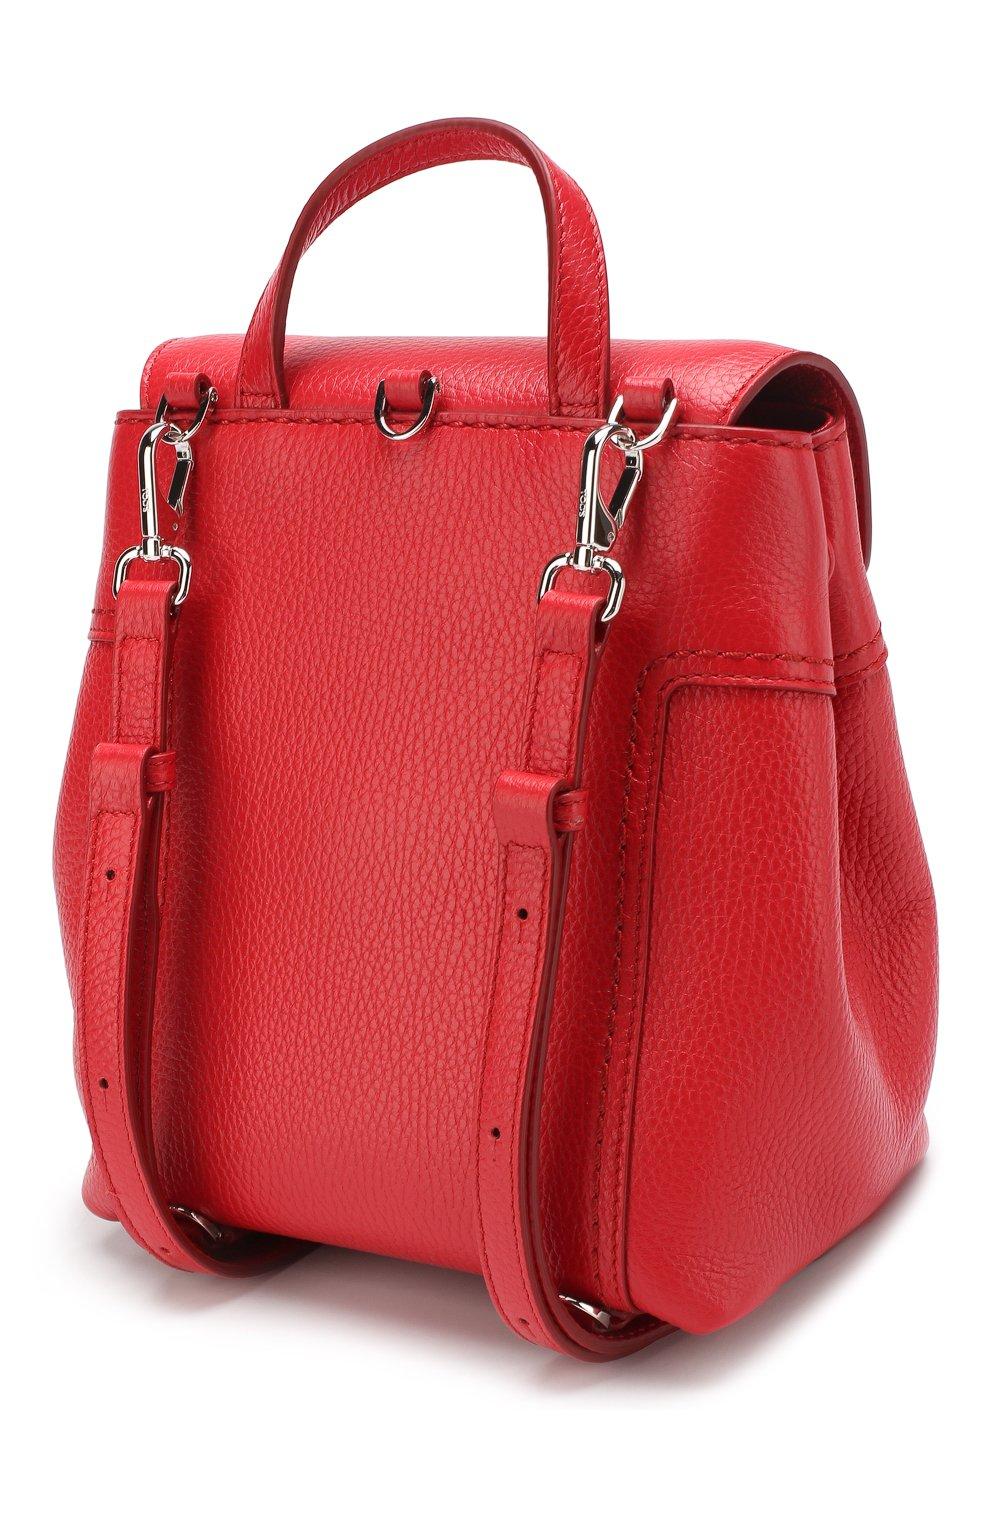 Рюкзак Double T Tod's красный | Фото №3